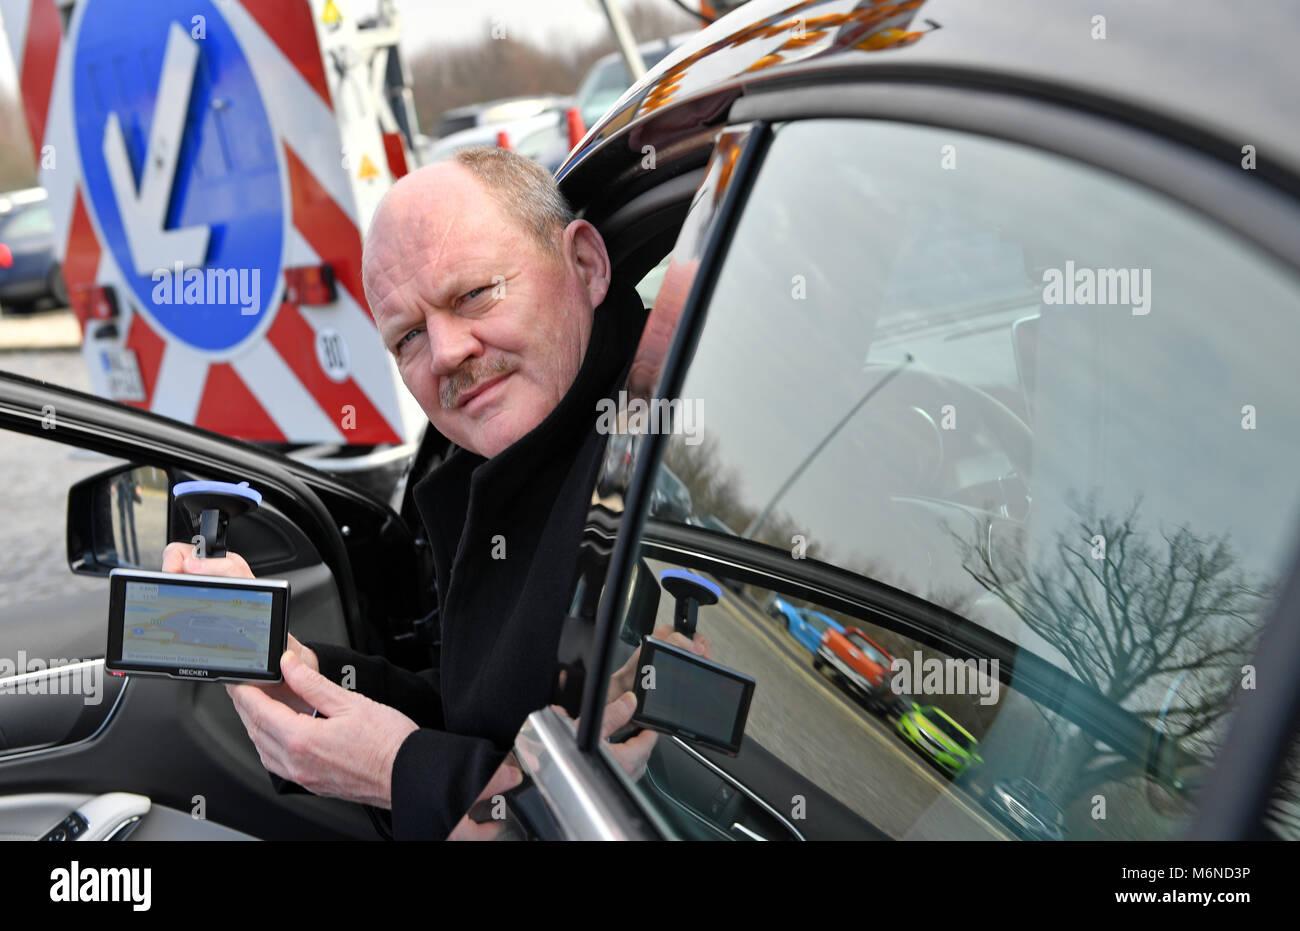 05 March 2018, Germany, Dessau-Rosslau: Thomas Webel (CDU), State Minister of Transport, holds a navigation system - Stock Image